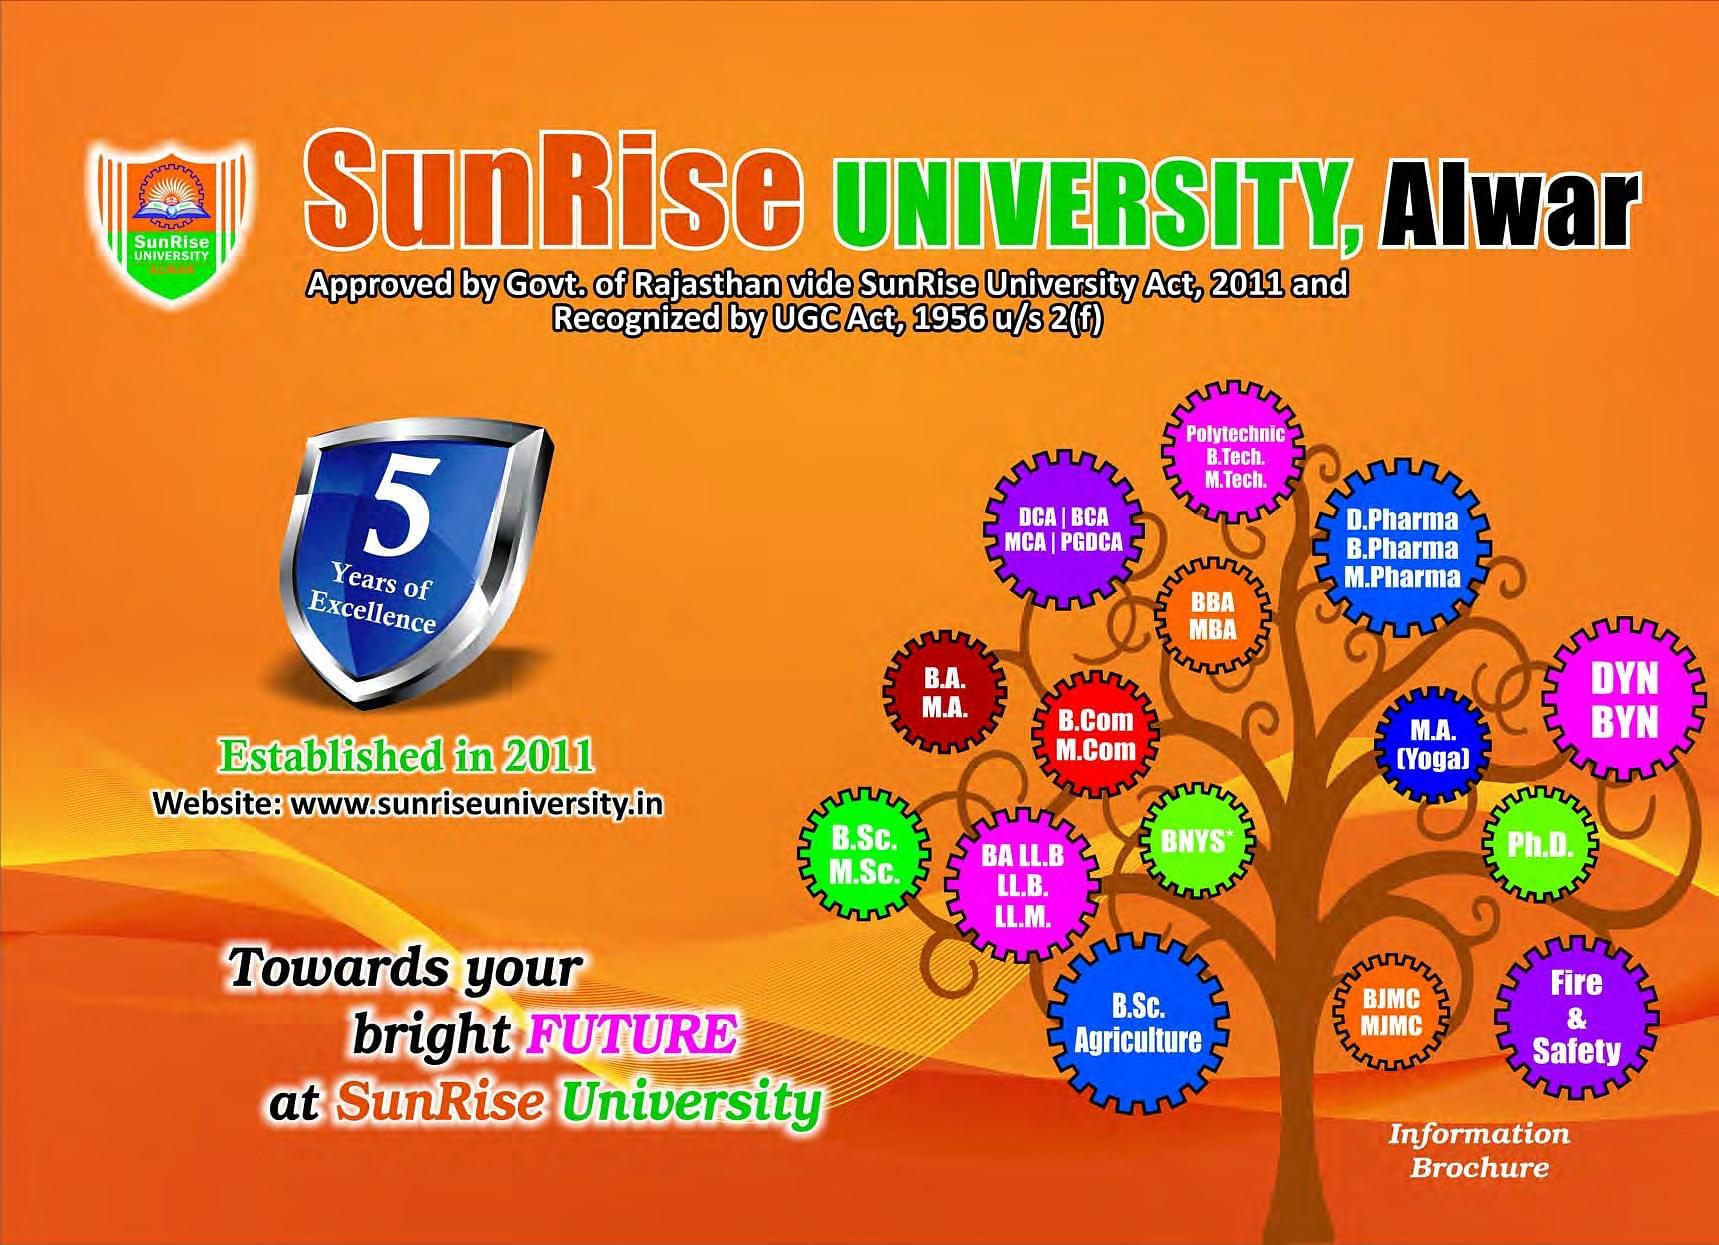 SunRise University (SRU), Alwar - Admissions, Courses, Fees, Placement